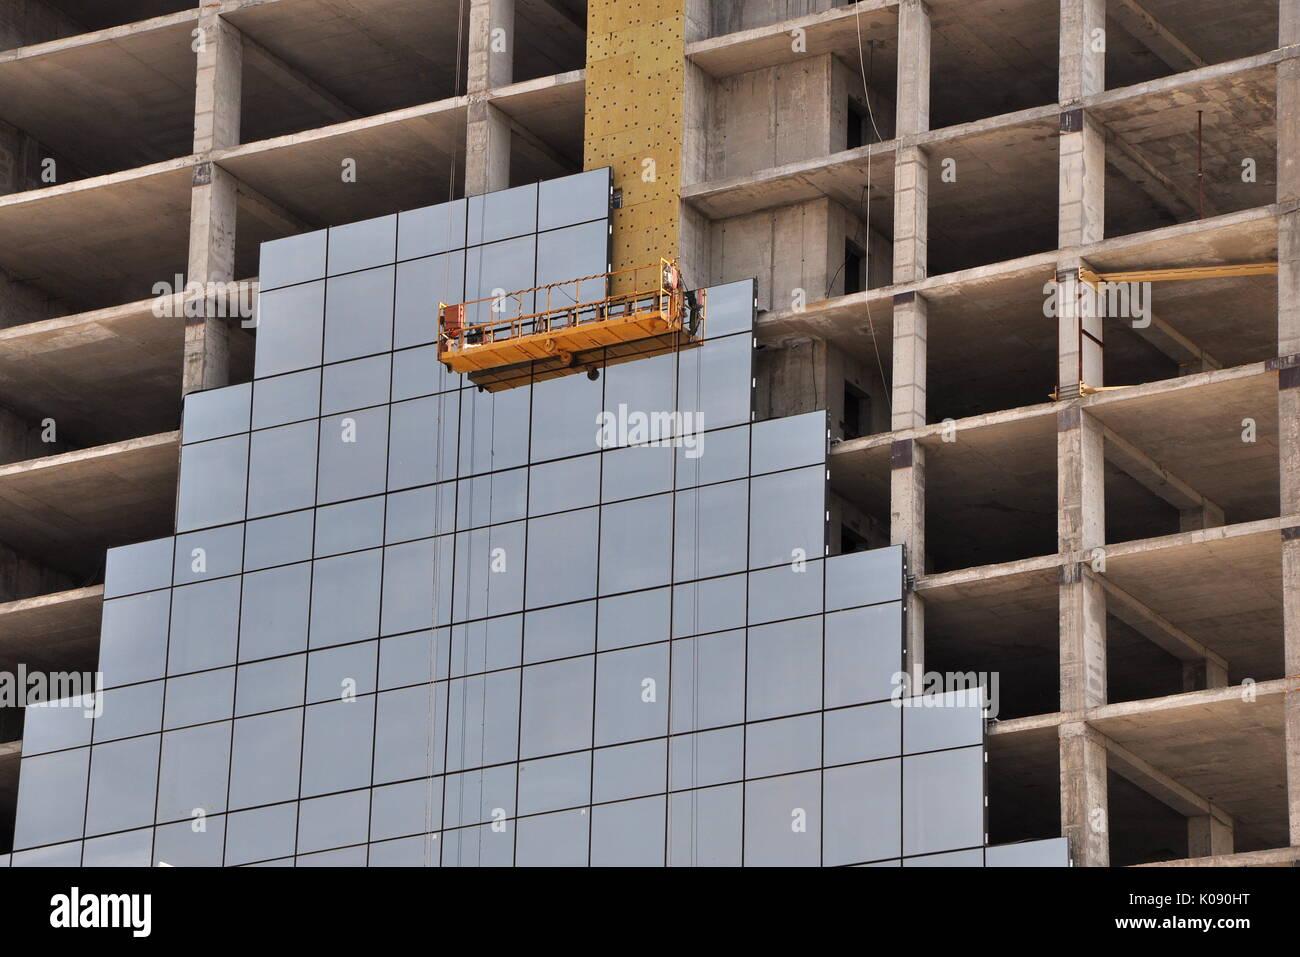 Facade Of A Skyscraper Framework Under Construction With A